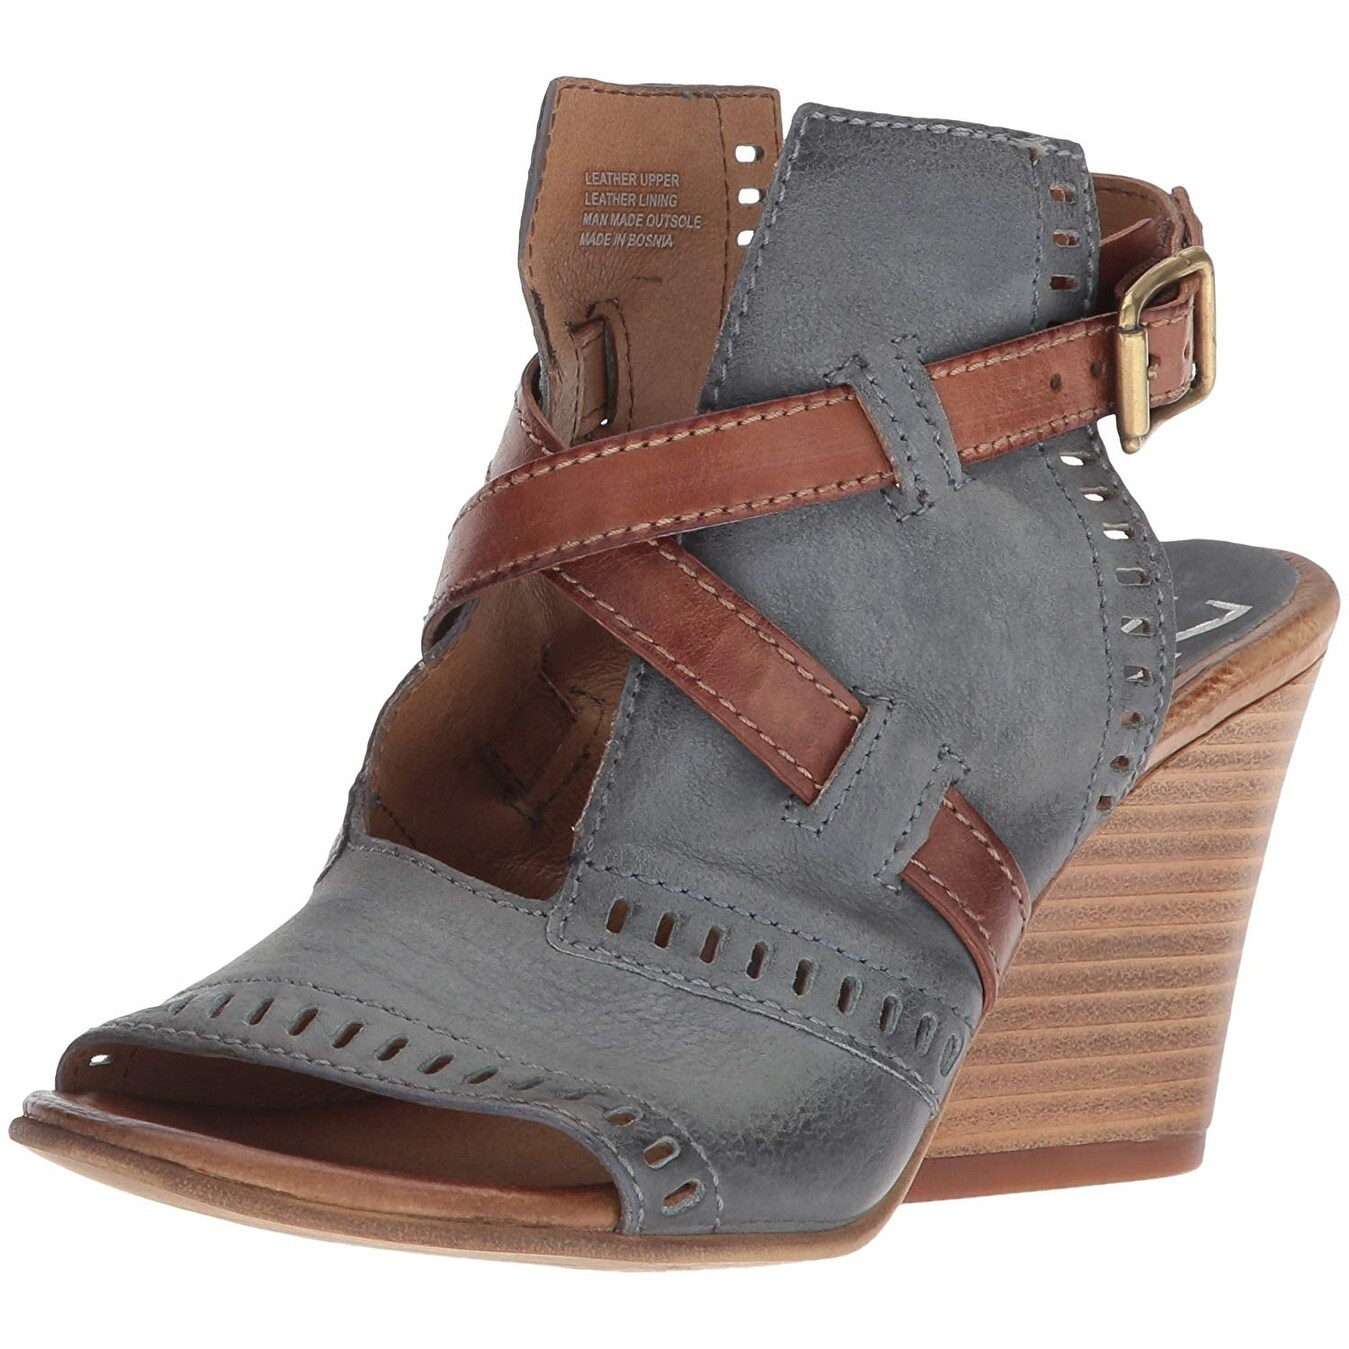 7bab1d25f19e8 Shop Miz Mooz Womens Kipling Leather Open Toe Casual Ankle Strap ...